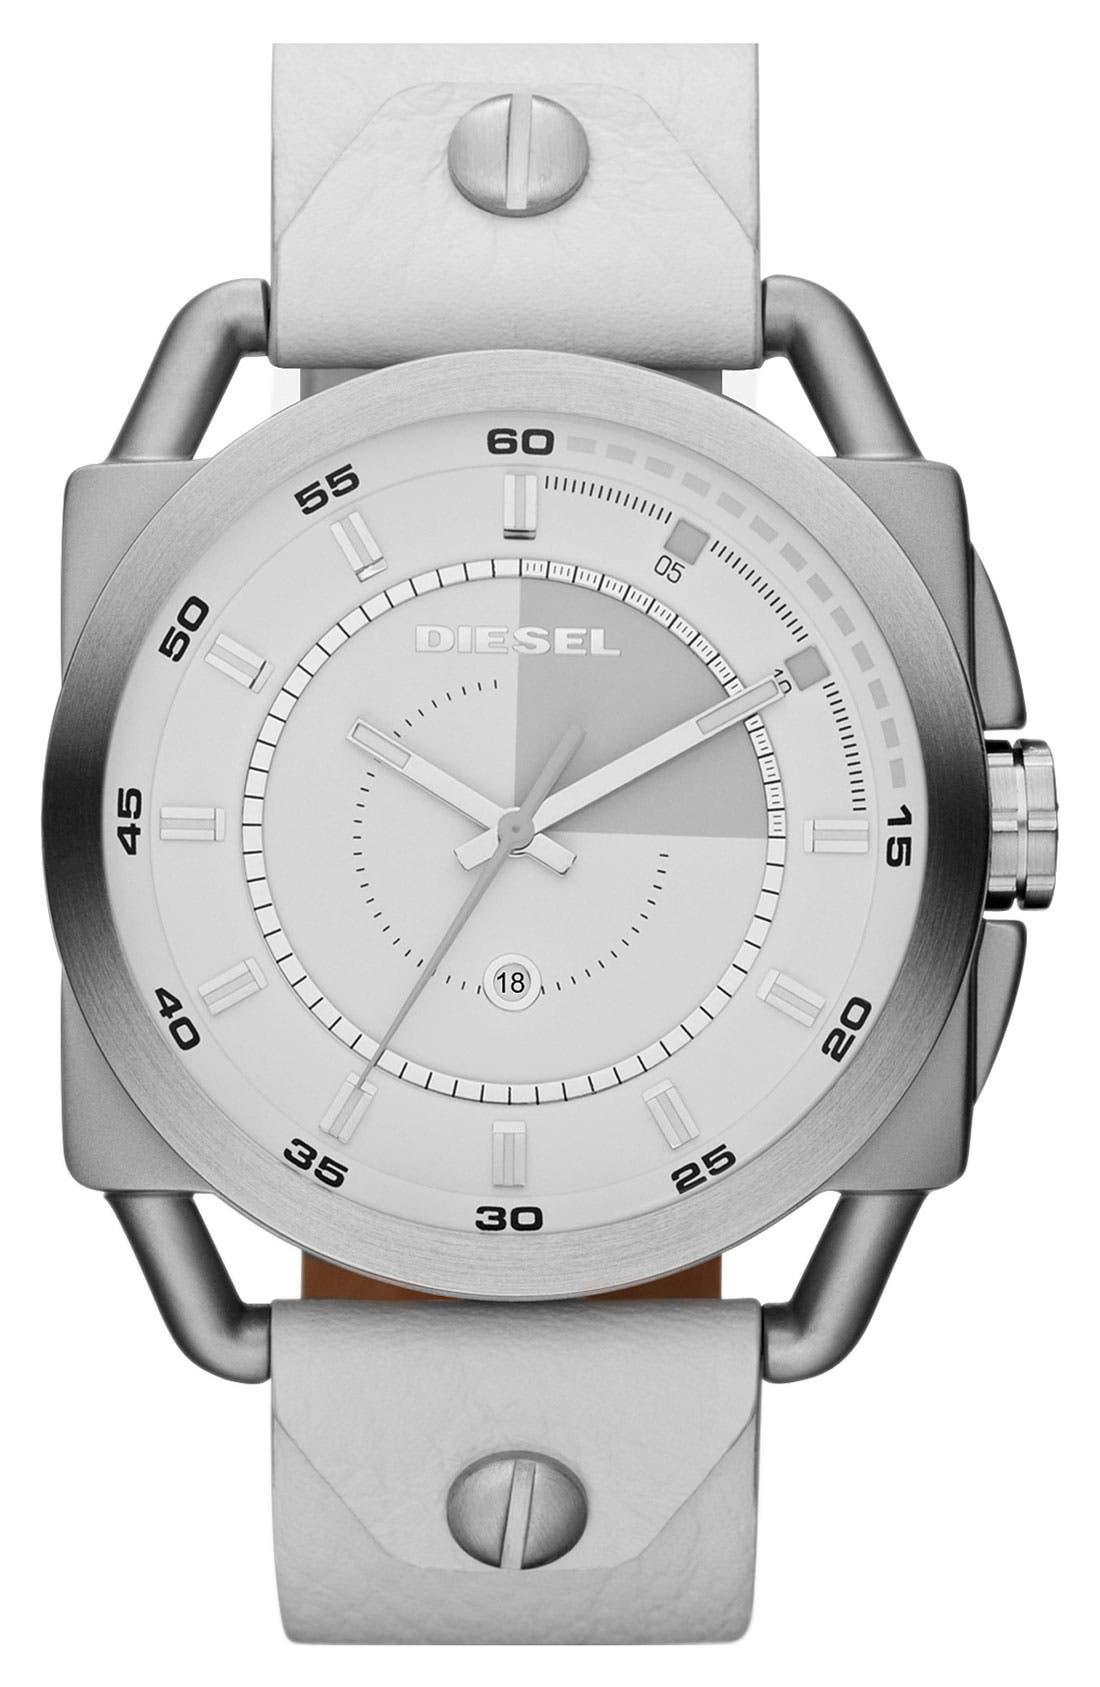 Main Image - DIESEL® 'Descender' Leather Strap Watch, 50mm